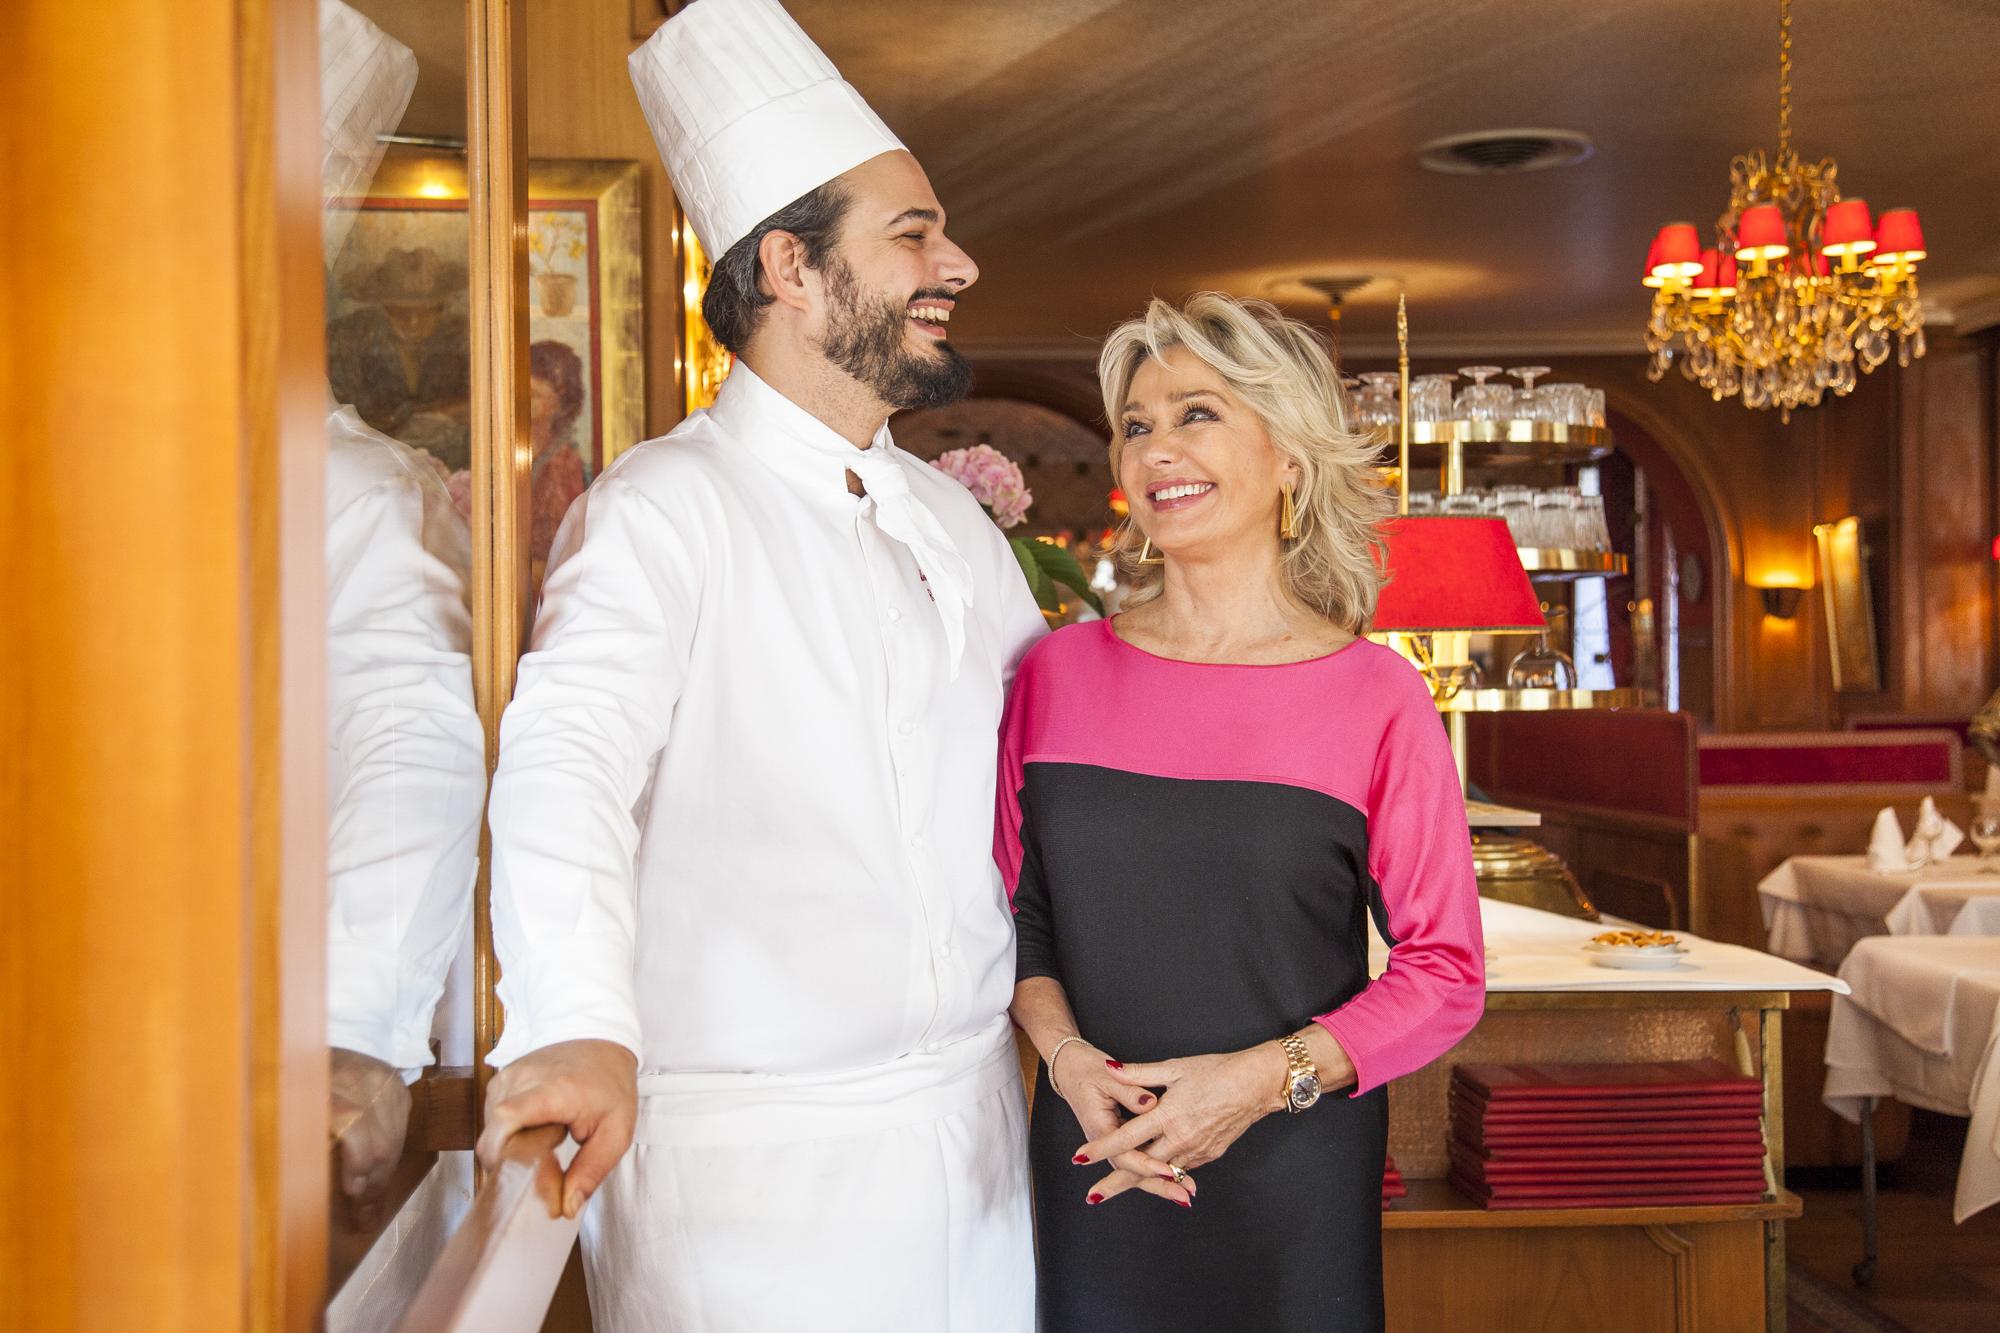 Chef Campana, Chez Roberto